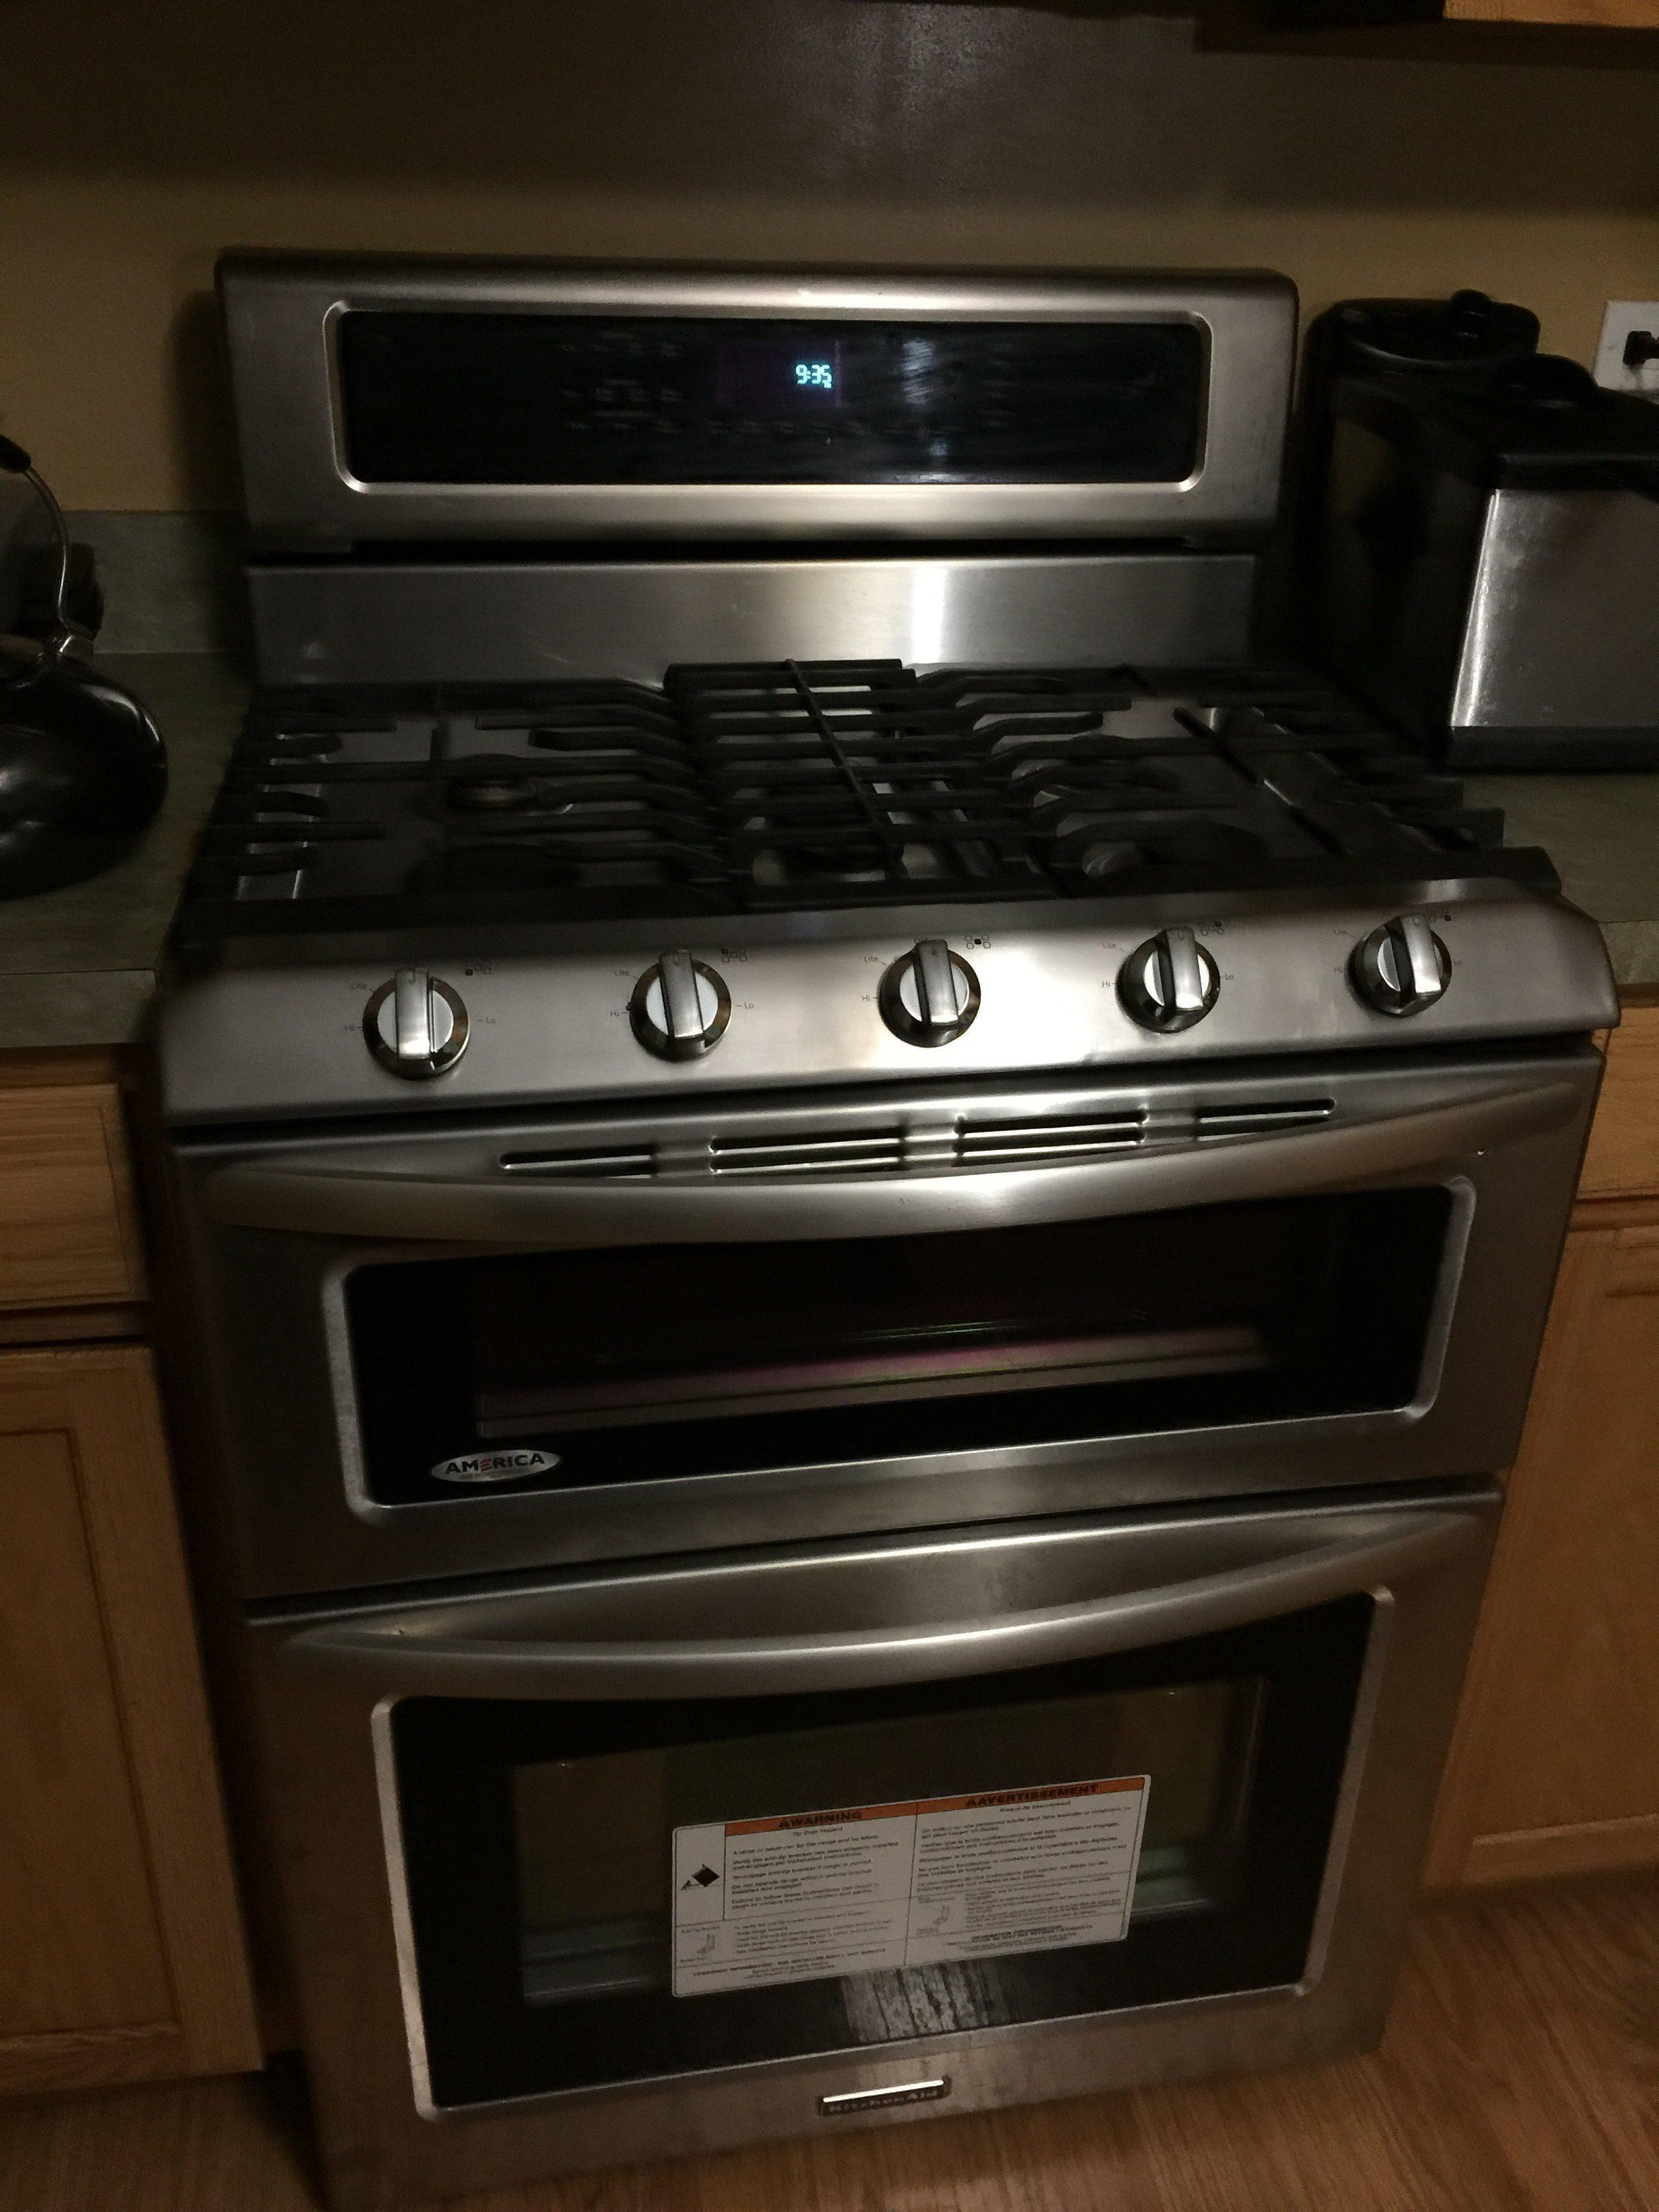 Kitchenaid Range Problems Kitchen Ideas